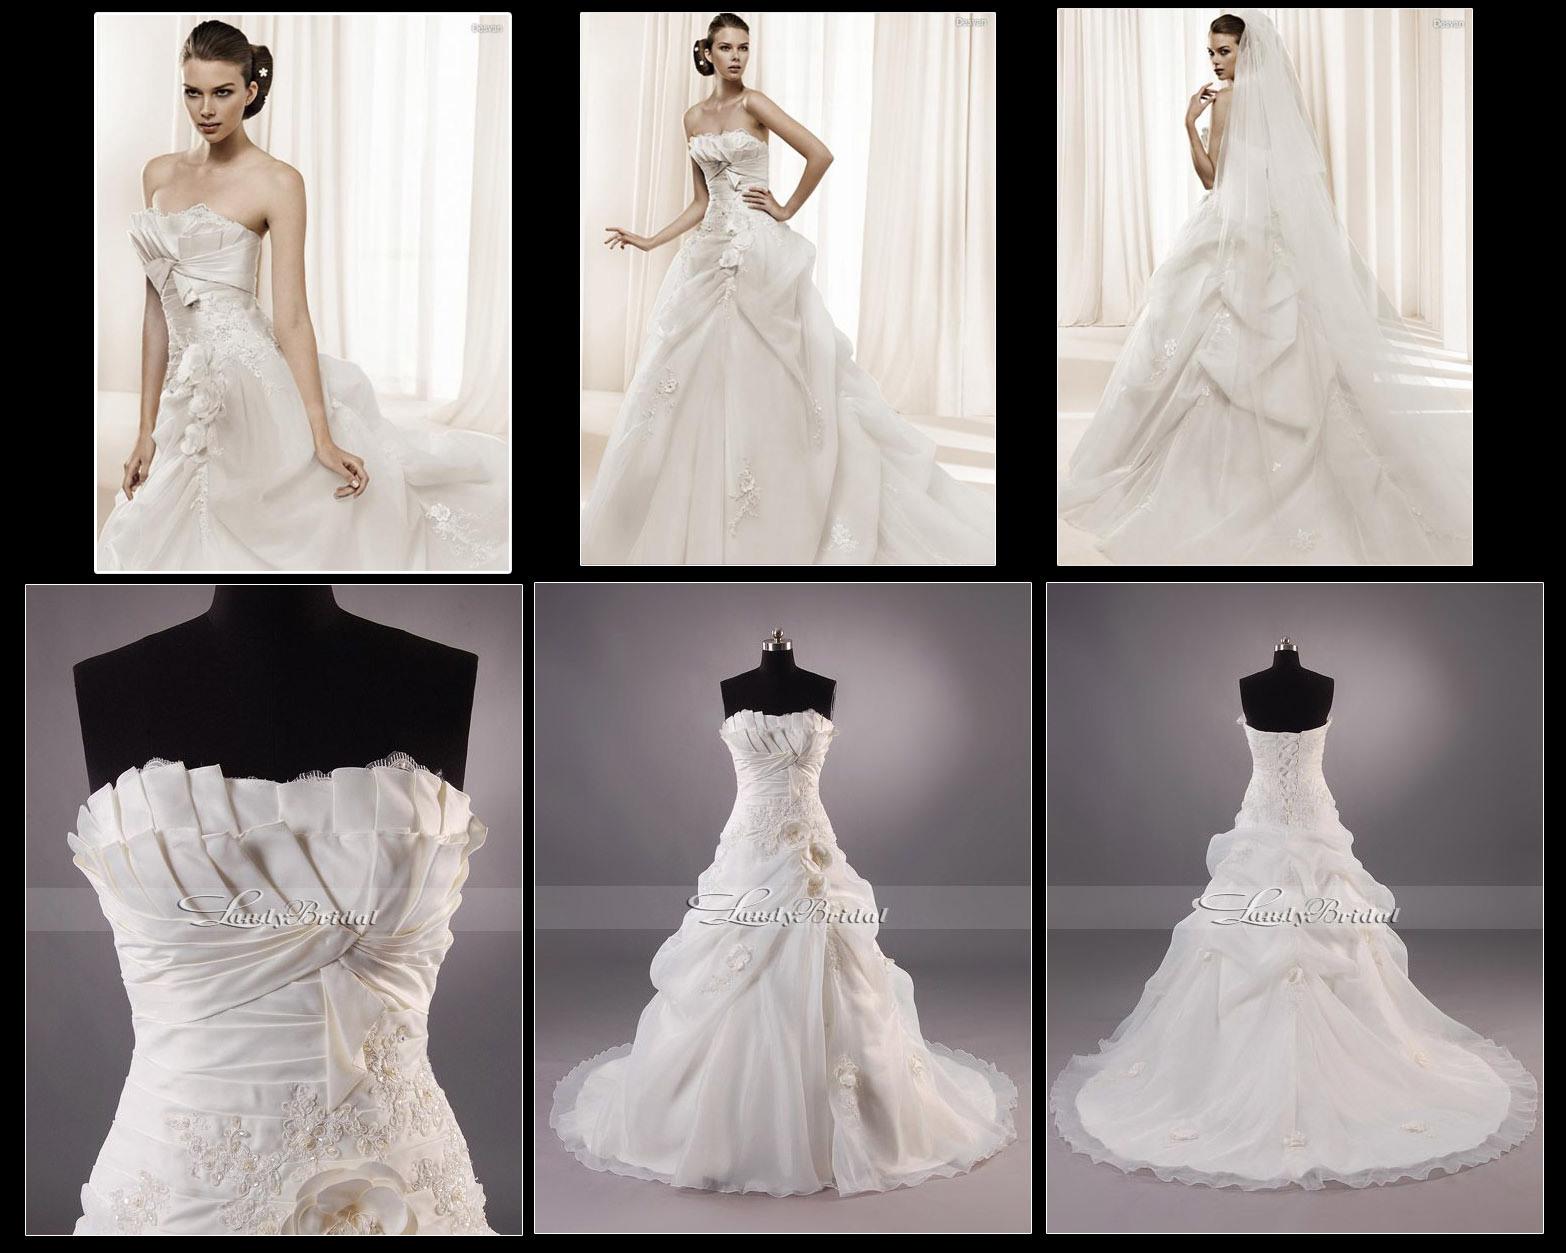 plastic bag dresses gorgeous wedding dresses 35 best images about plastic bag dresses on Pinterest Bags Alexander mcqueen savage beauty and Paper fashion